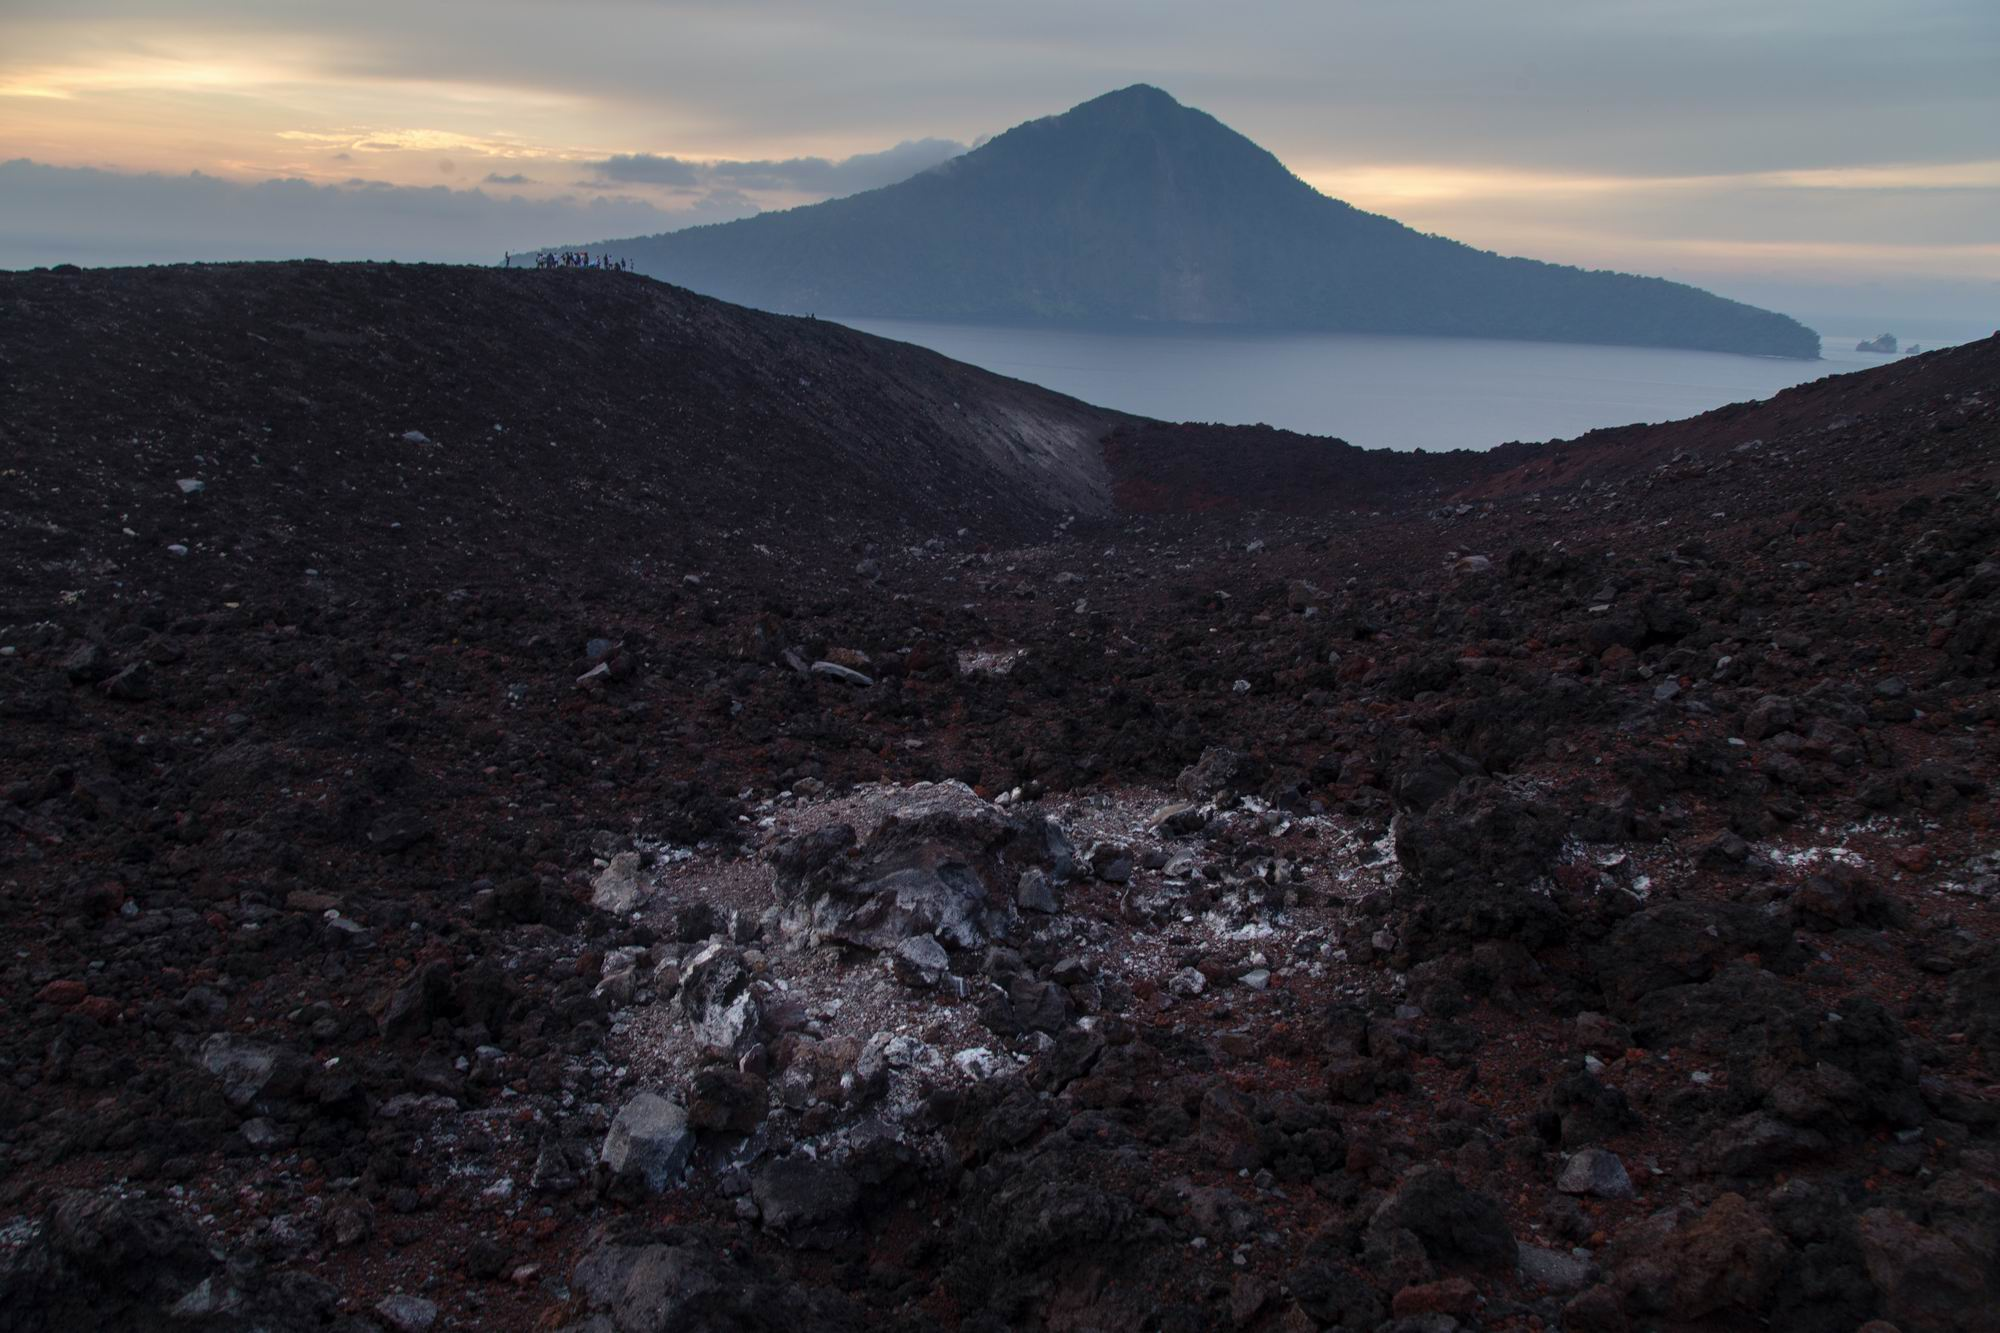 1358 Anak Krakatau ©2018 Deni Sugandi